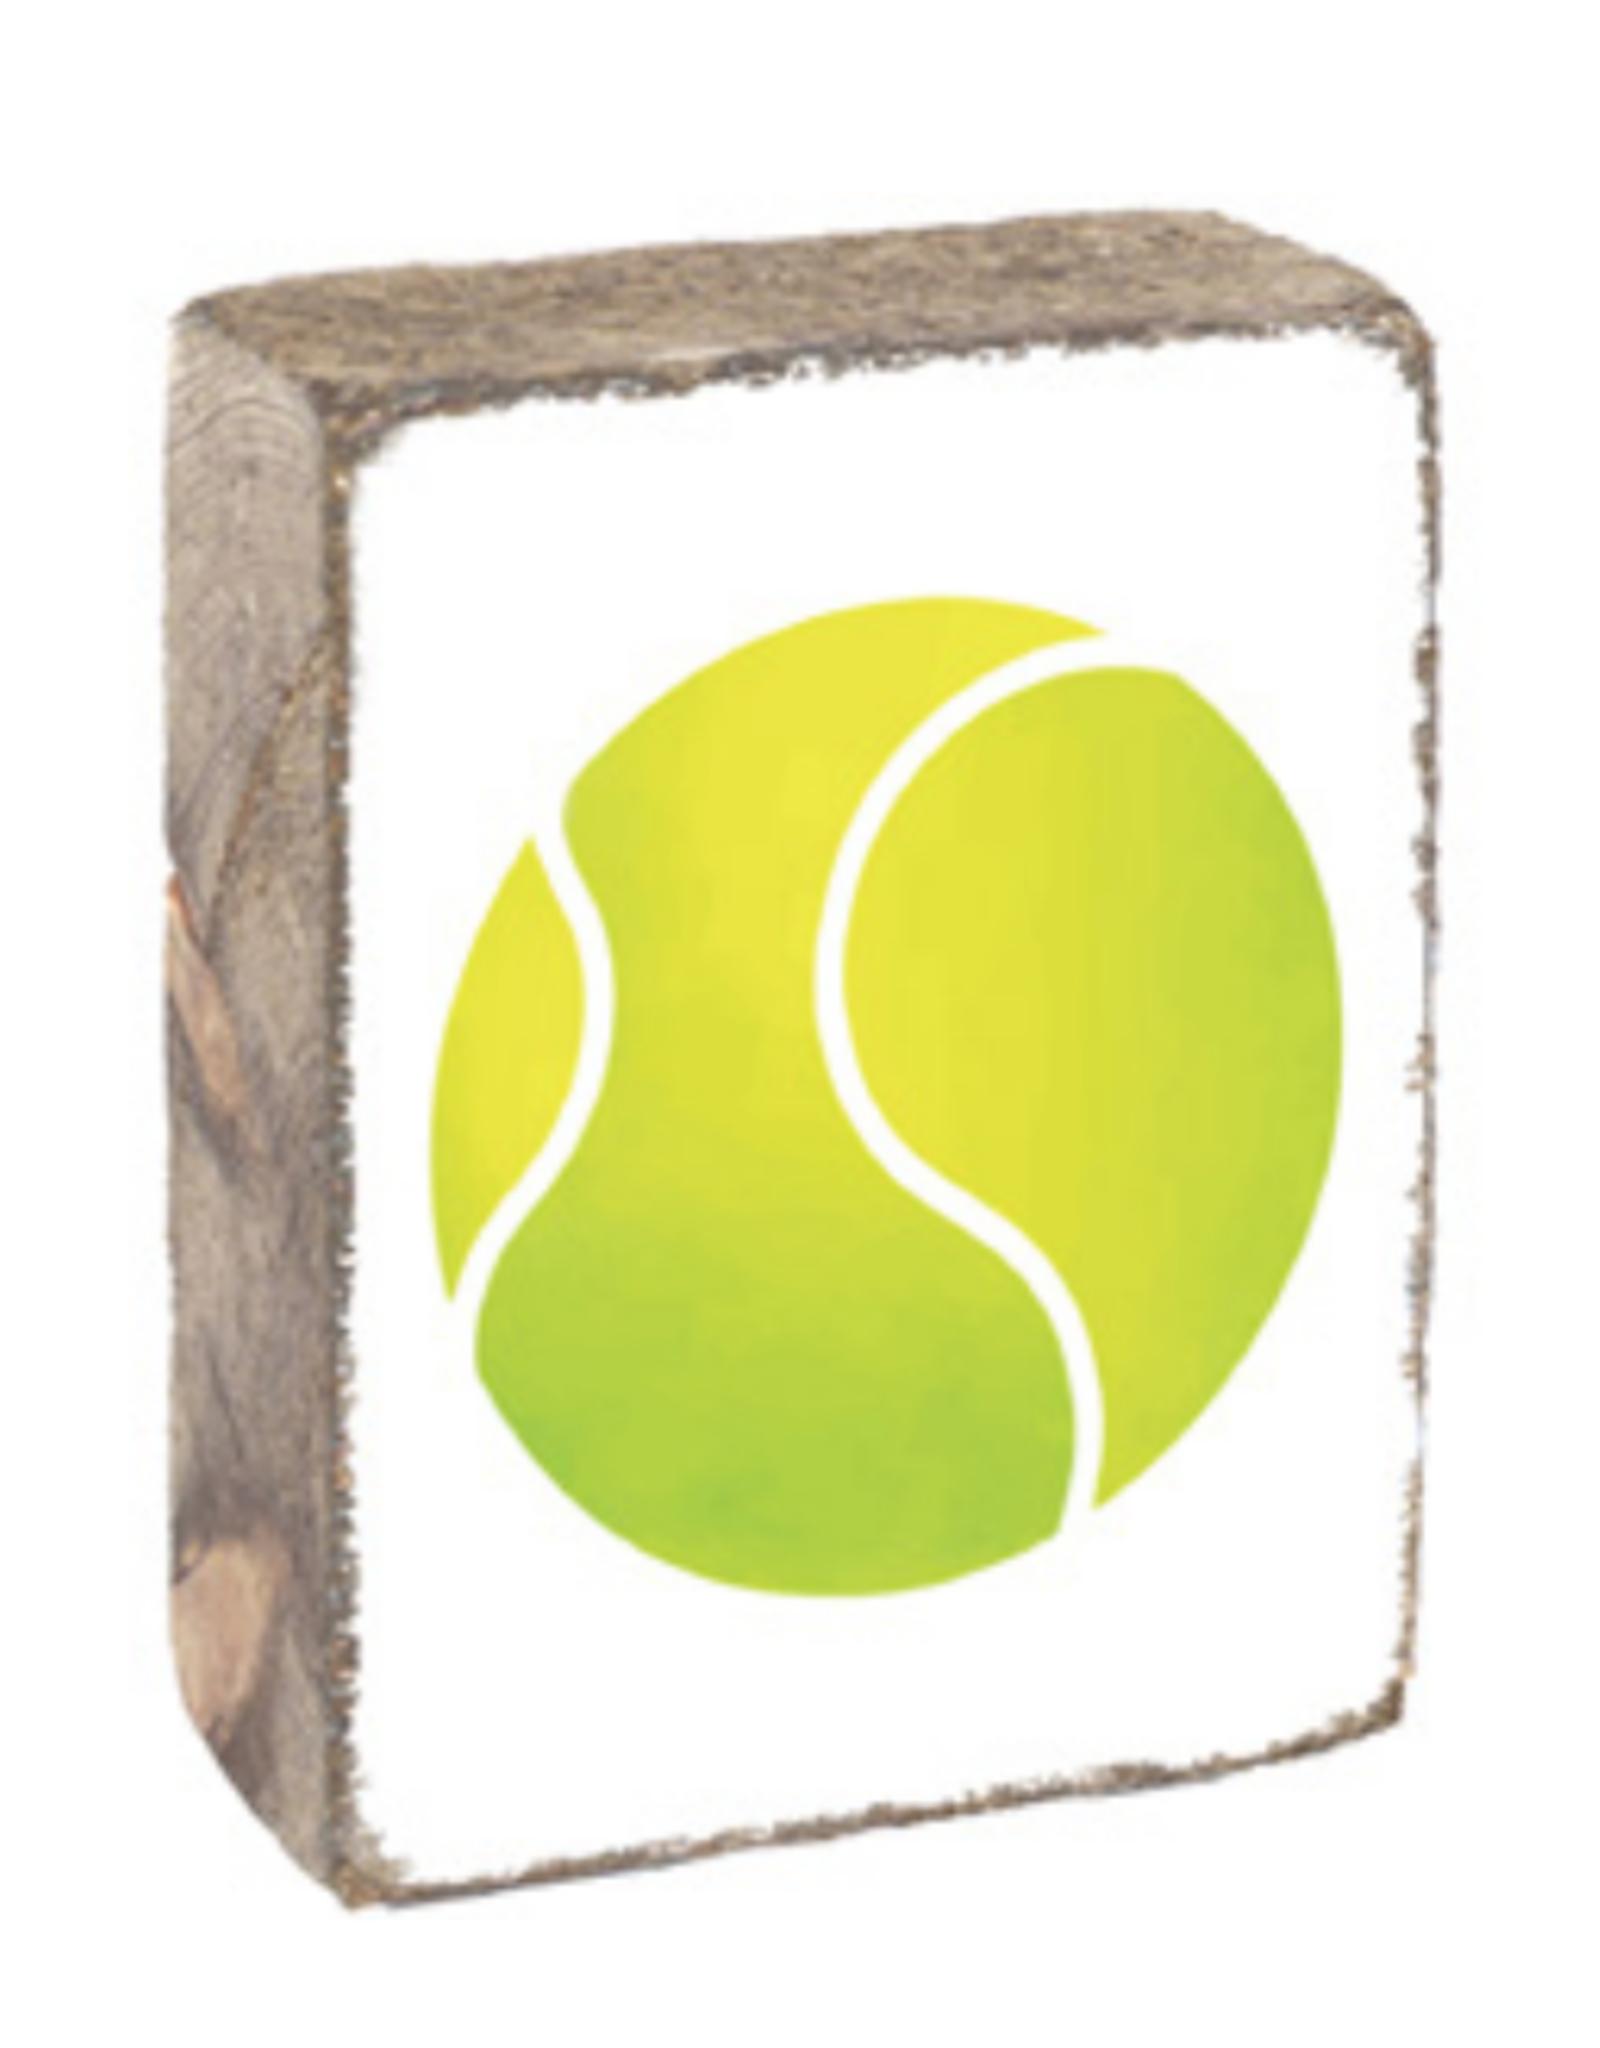 Rustic Marlin Rustic Marlin - Symbol Blocks Tennis